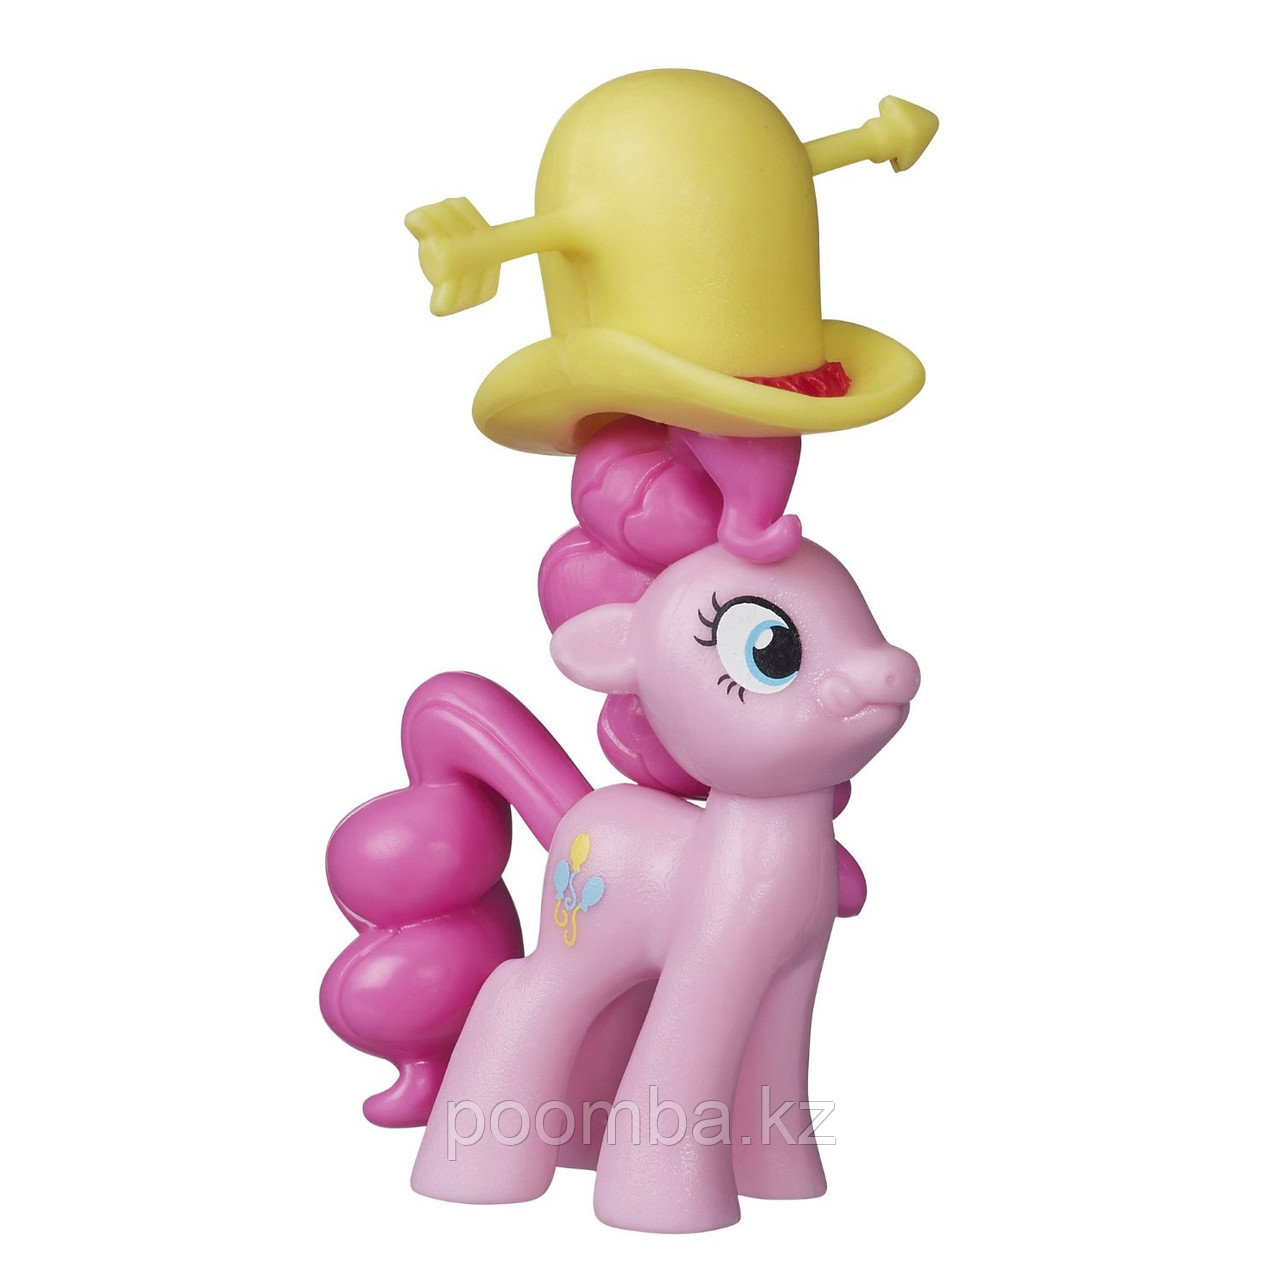 Коллекционная фигурка My Little Pony - Pinkie Pie, 2 волна